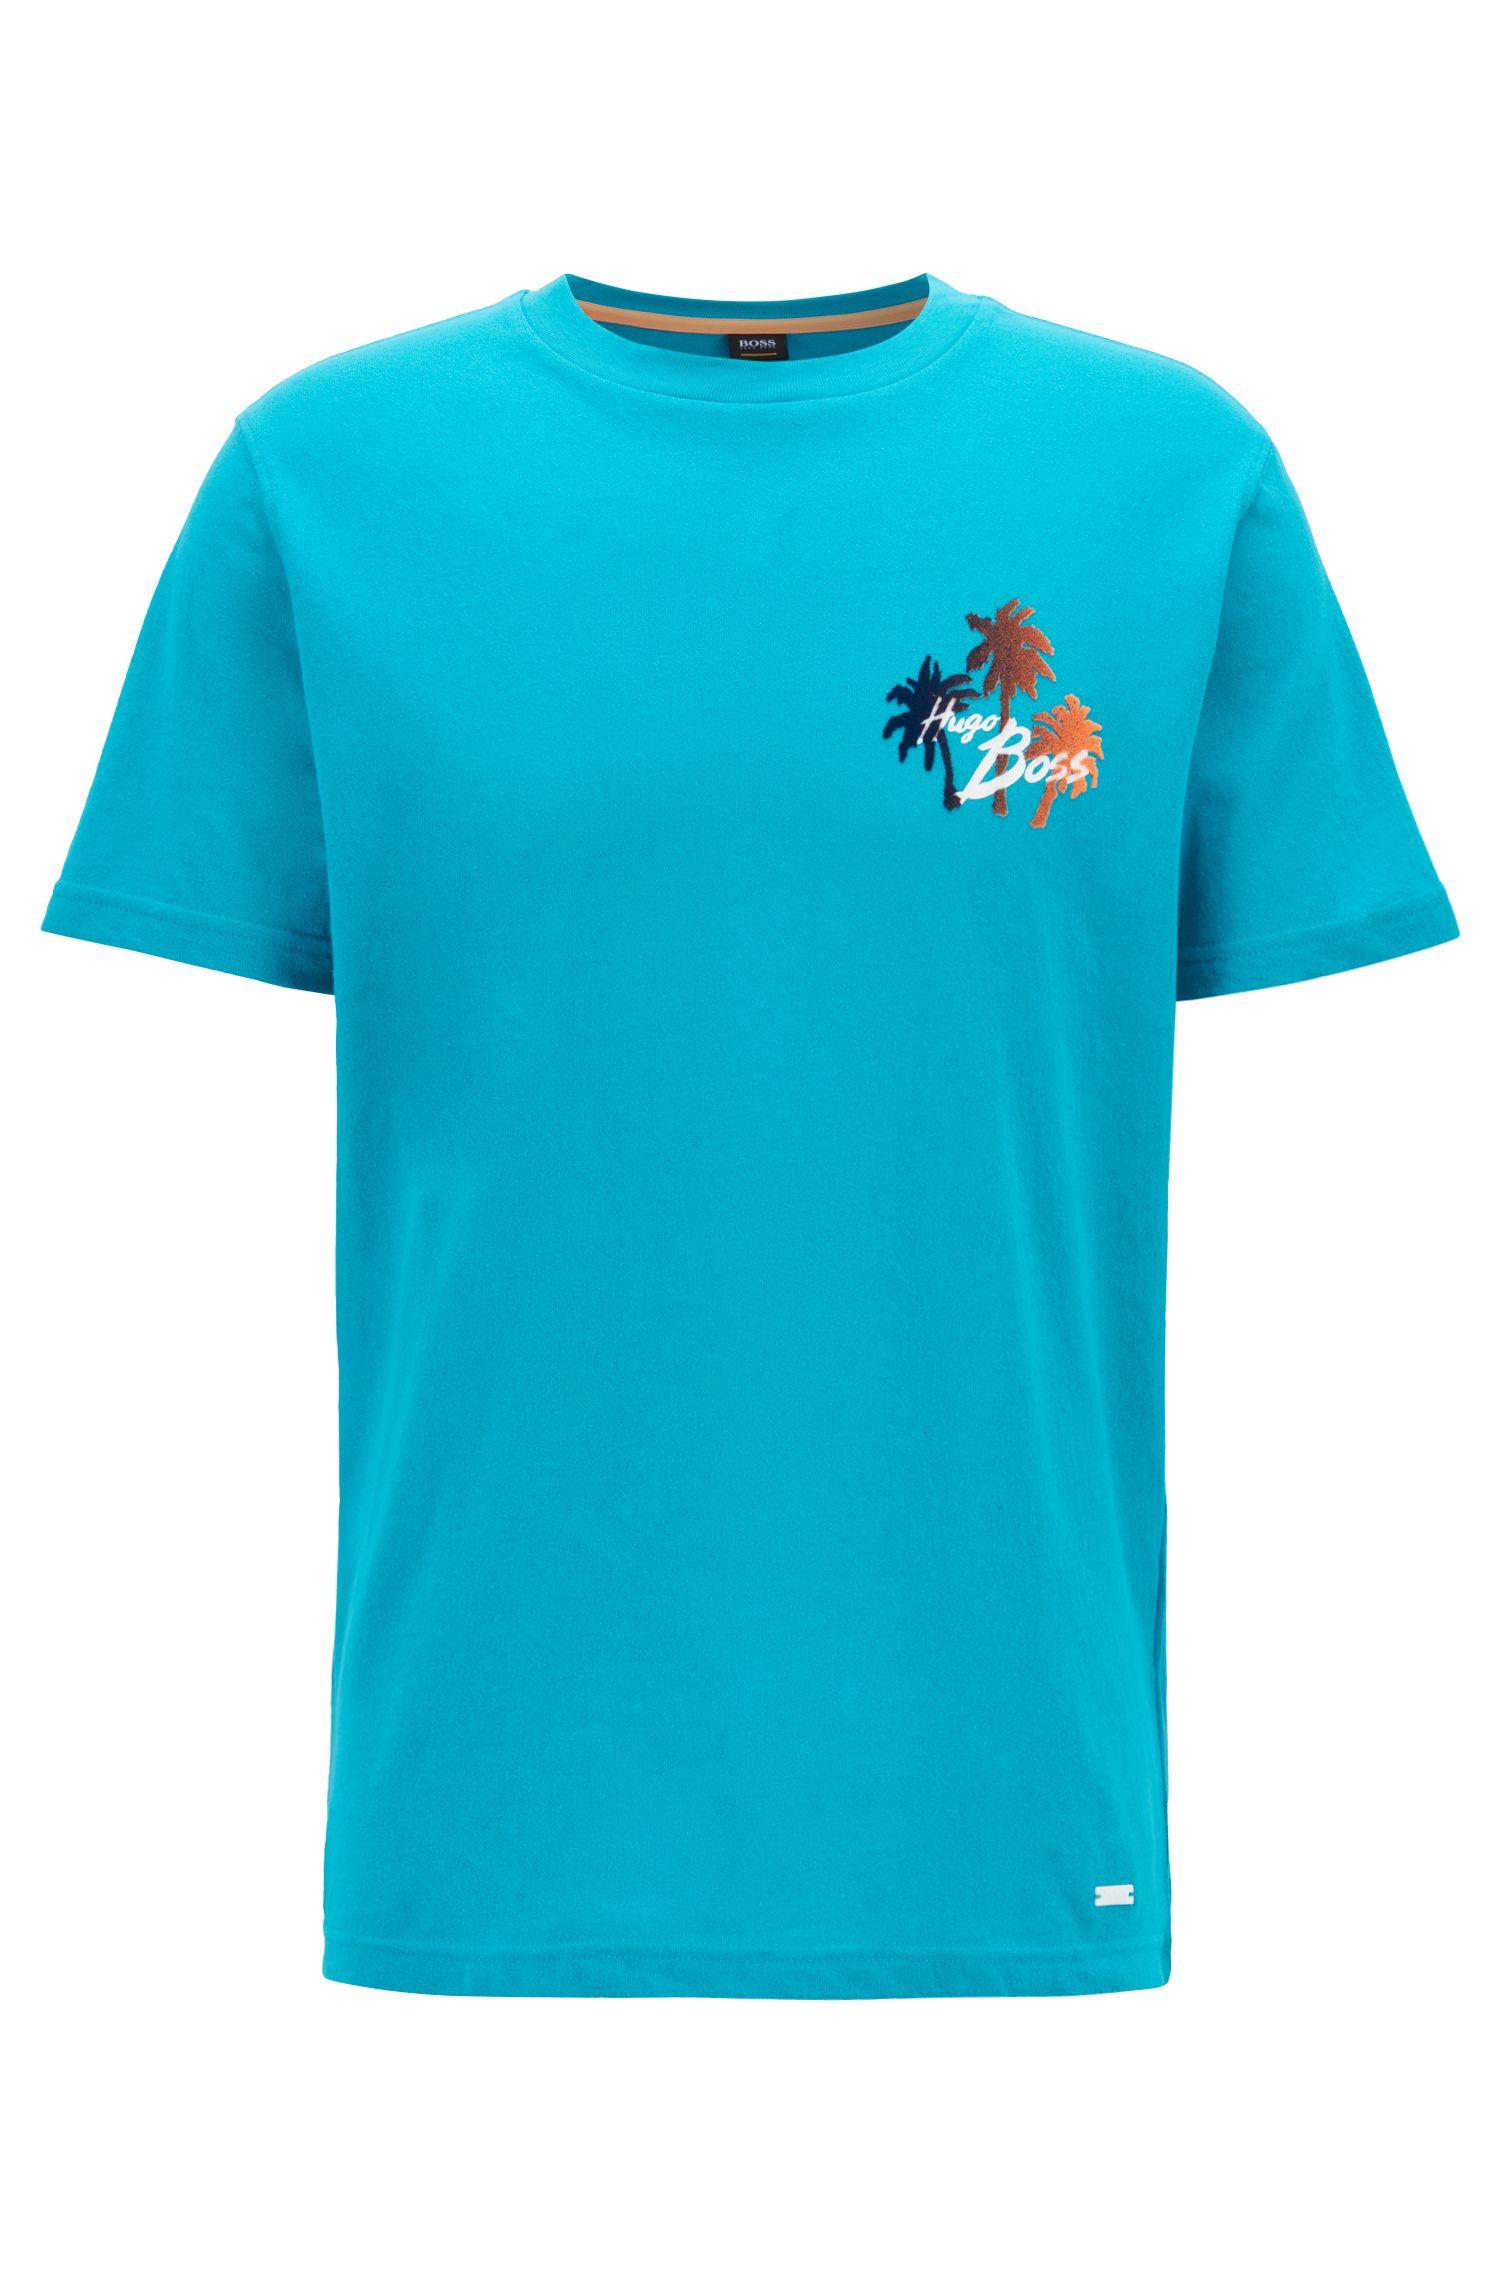 Camiseta relaxed fit con estampado gráfico de efecto ante, Azul